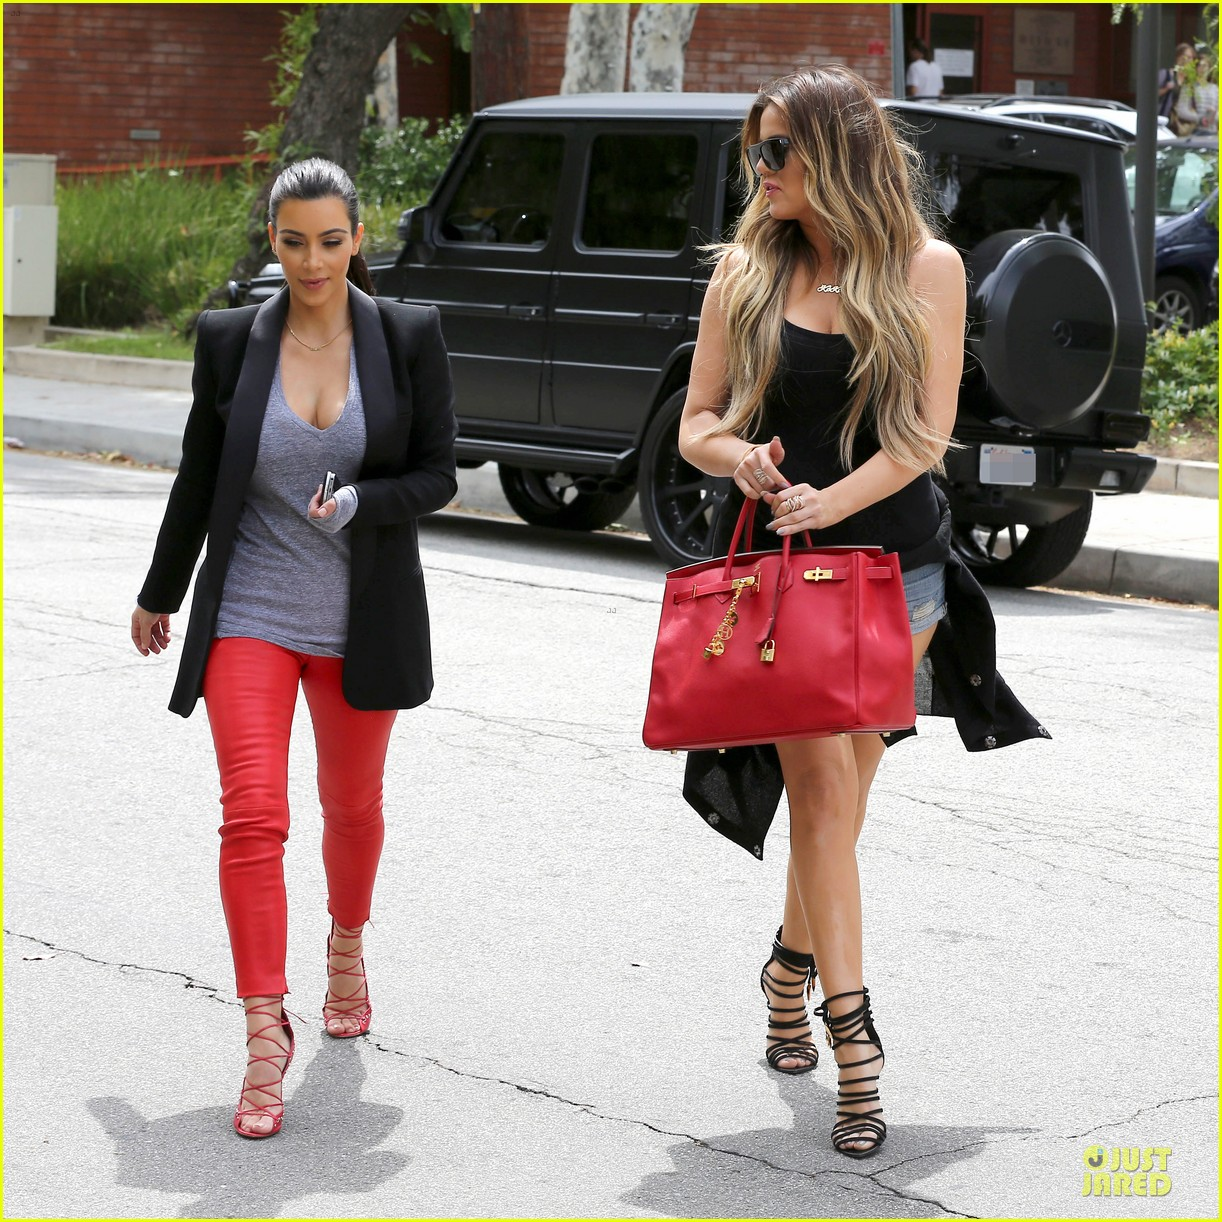 kim kardashian likes to tell sis khloe to drink it up 24